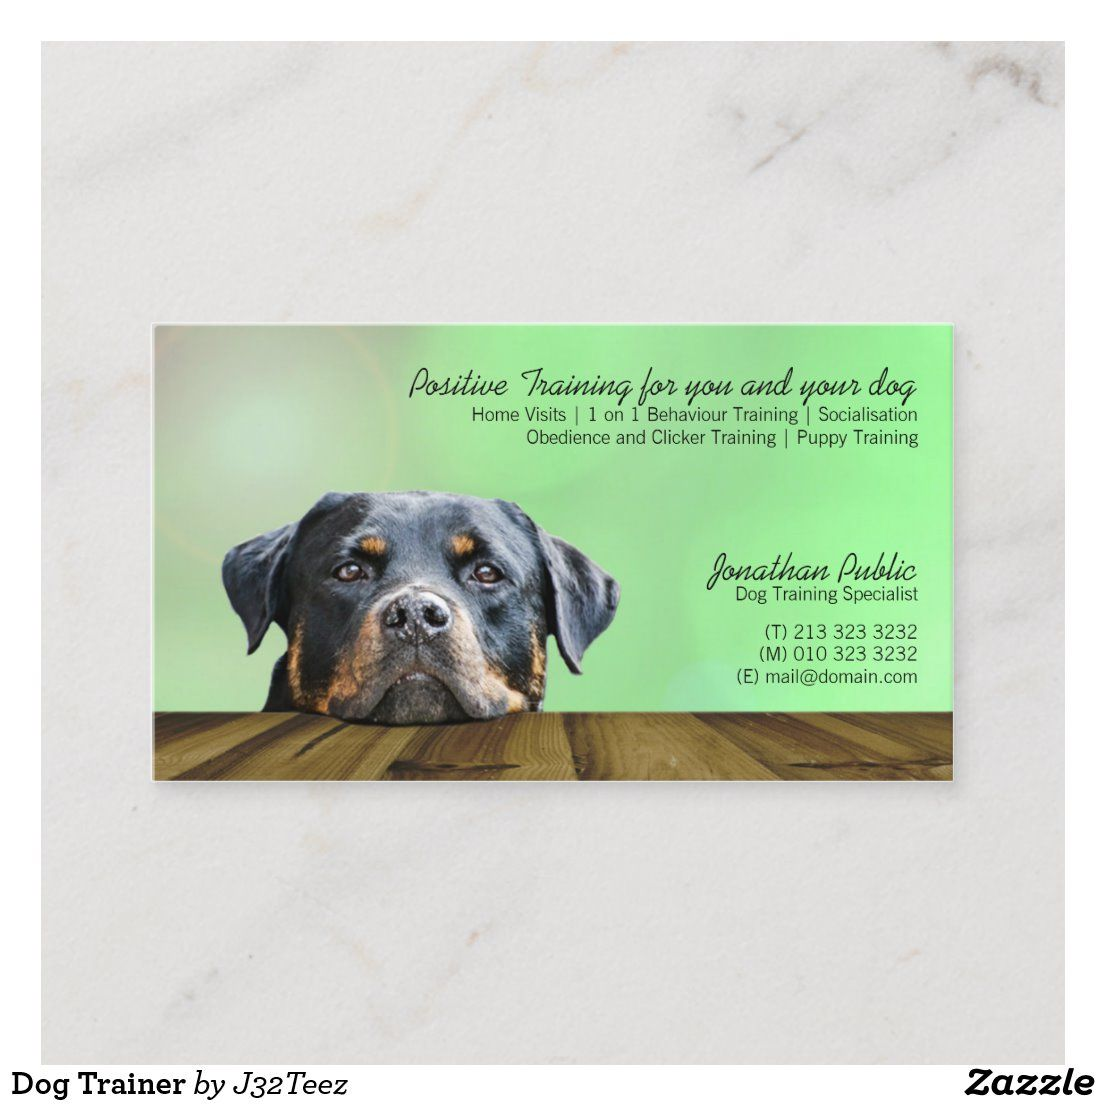 Dog Trainer Business Card Zazzle Com In 2020 Dog Trainer Dog